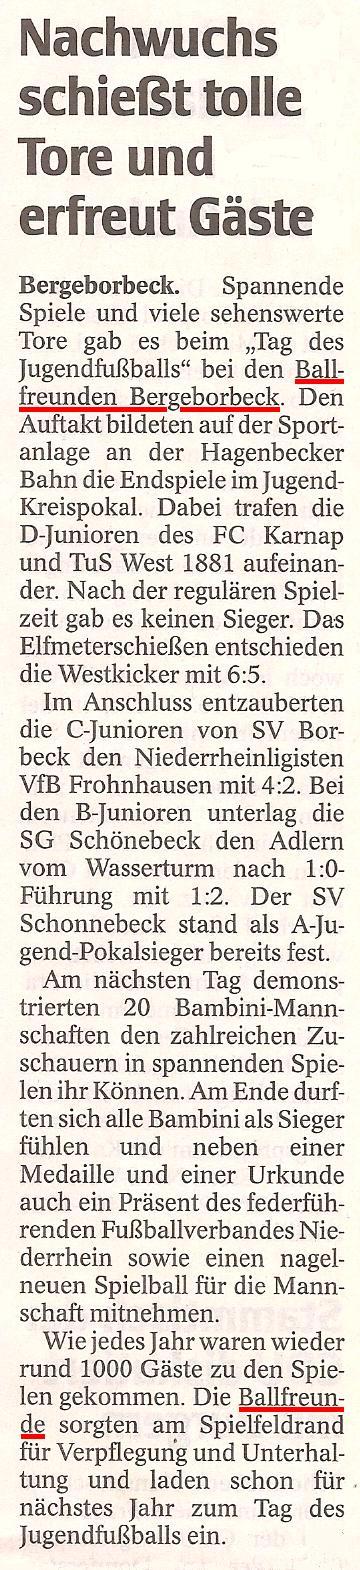 WAZ-Bericht vom Tag des Jugendfussballs am 2. Mai 2010